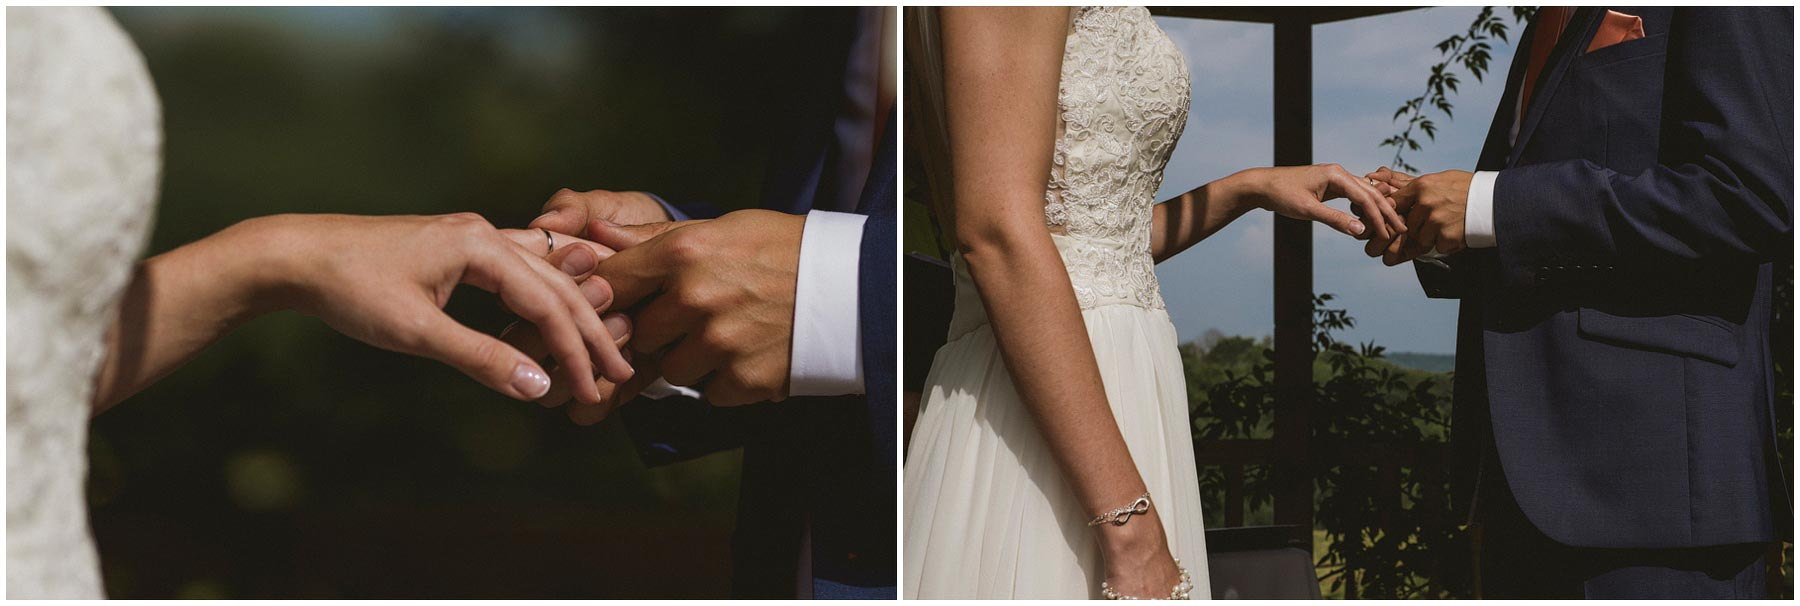 Colehayes-Park-Wedding-Photography_0078